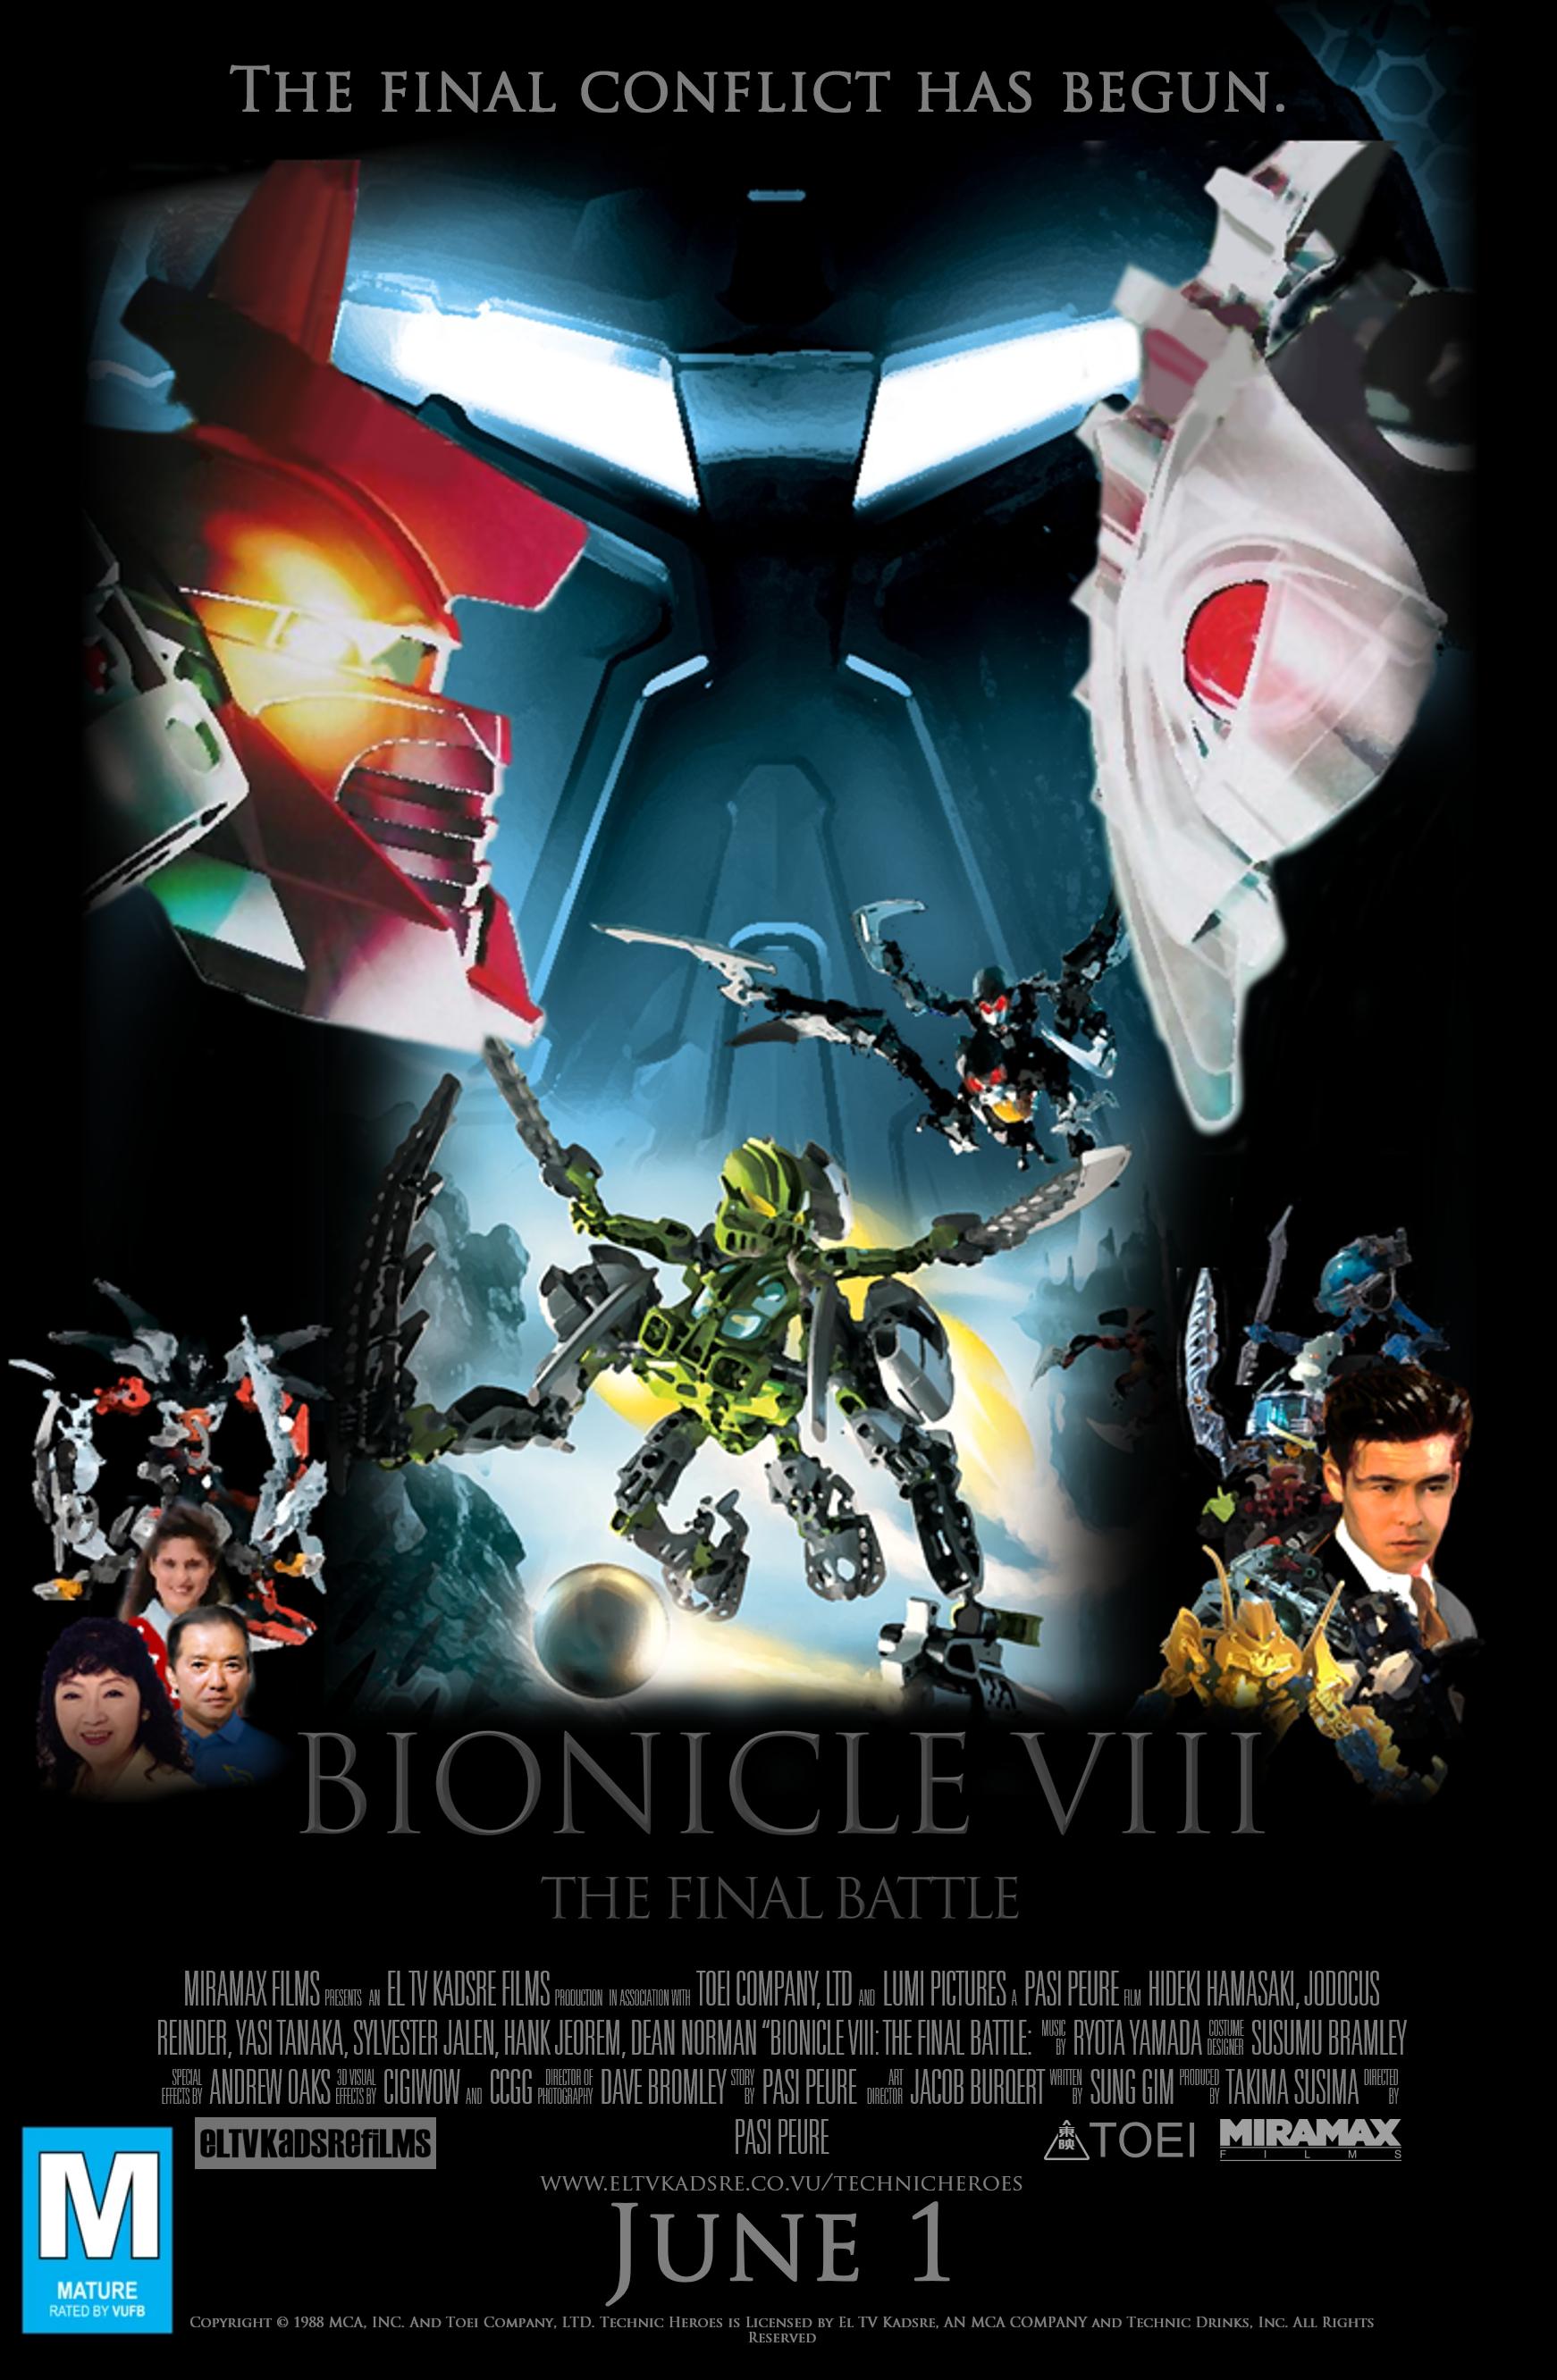 Bionicle VIII: The Final Battle